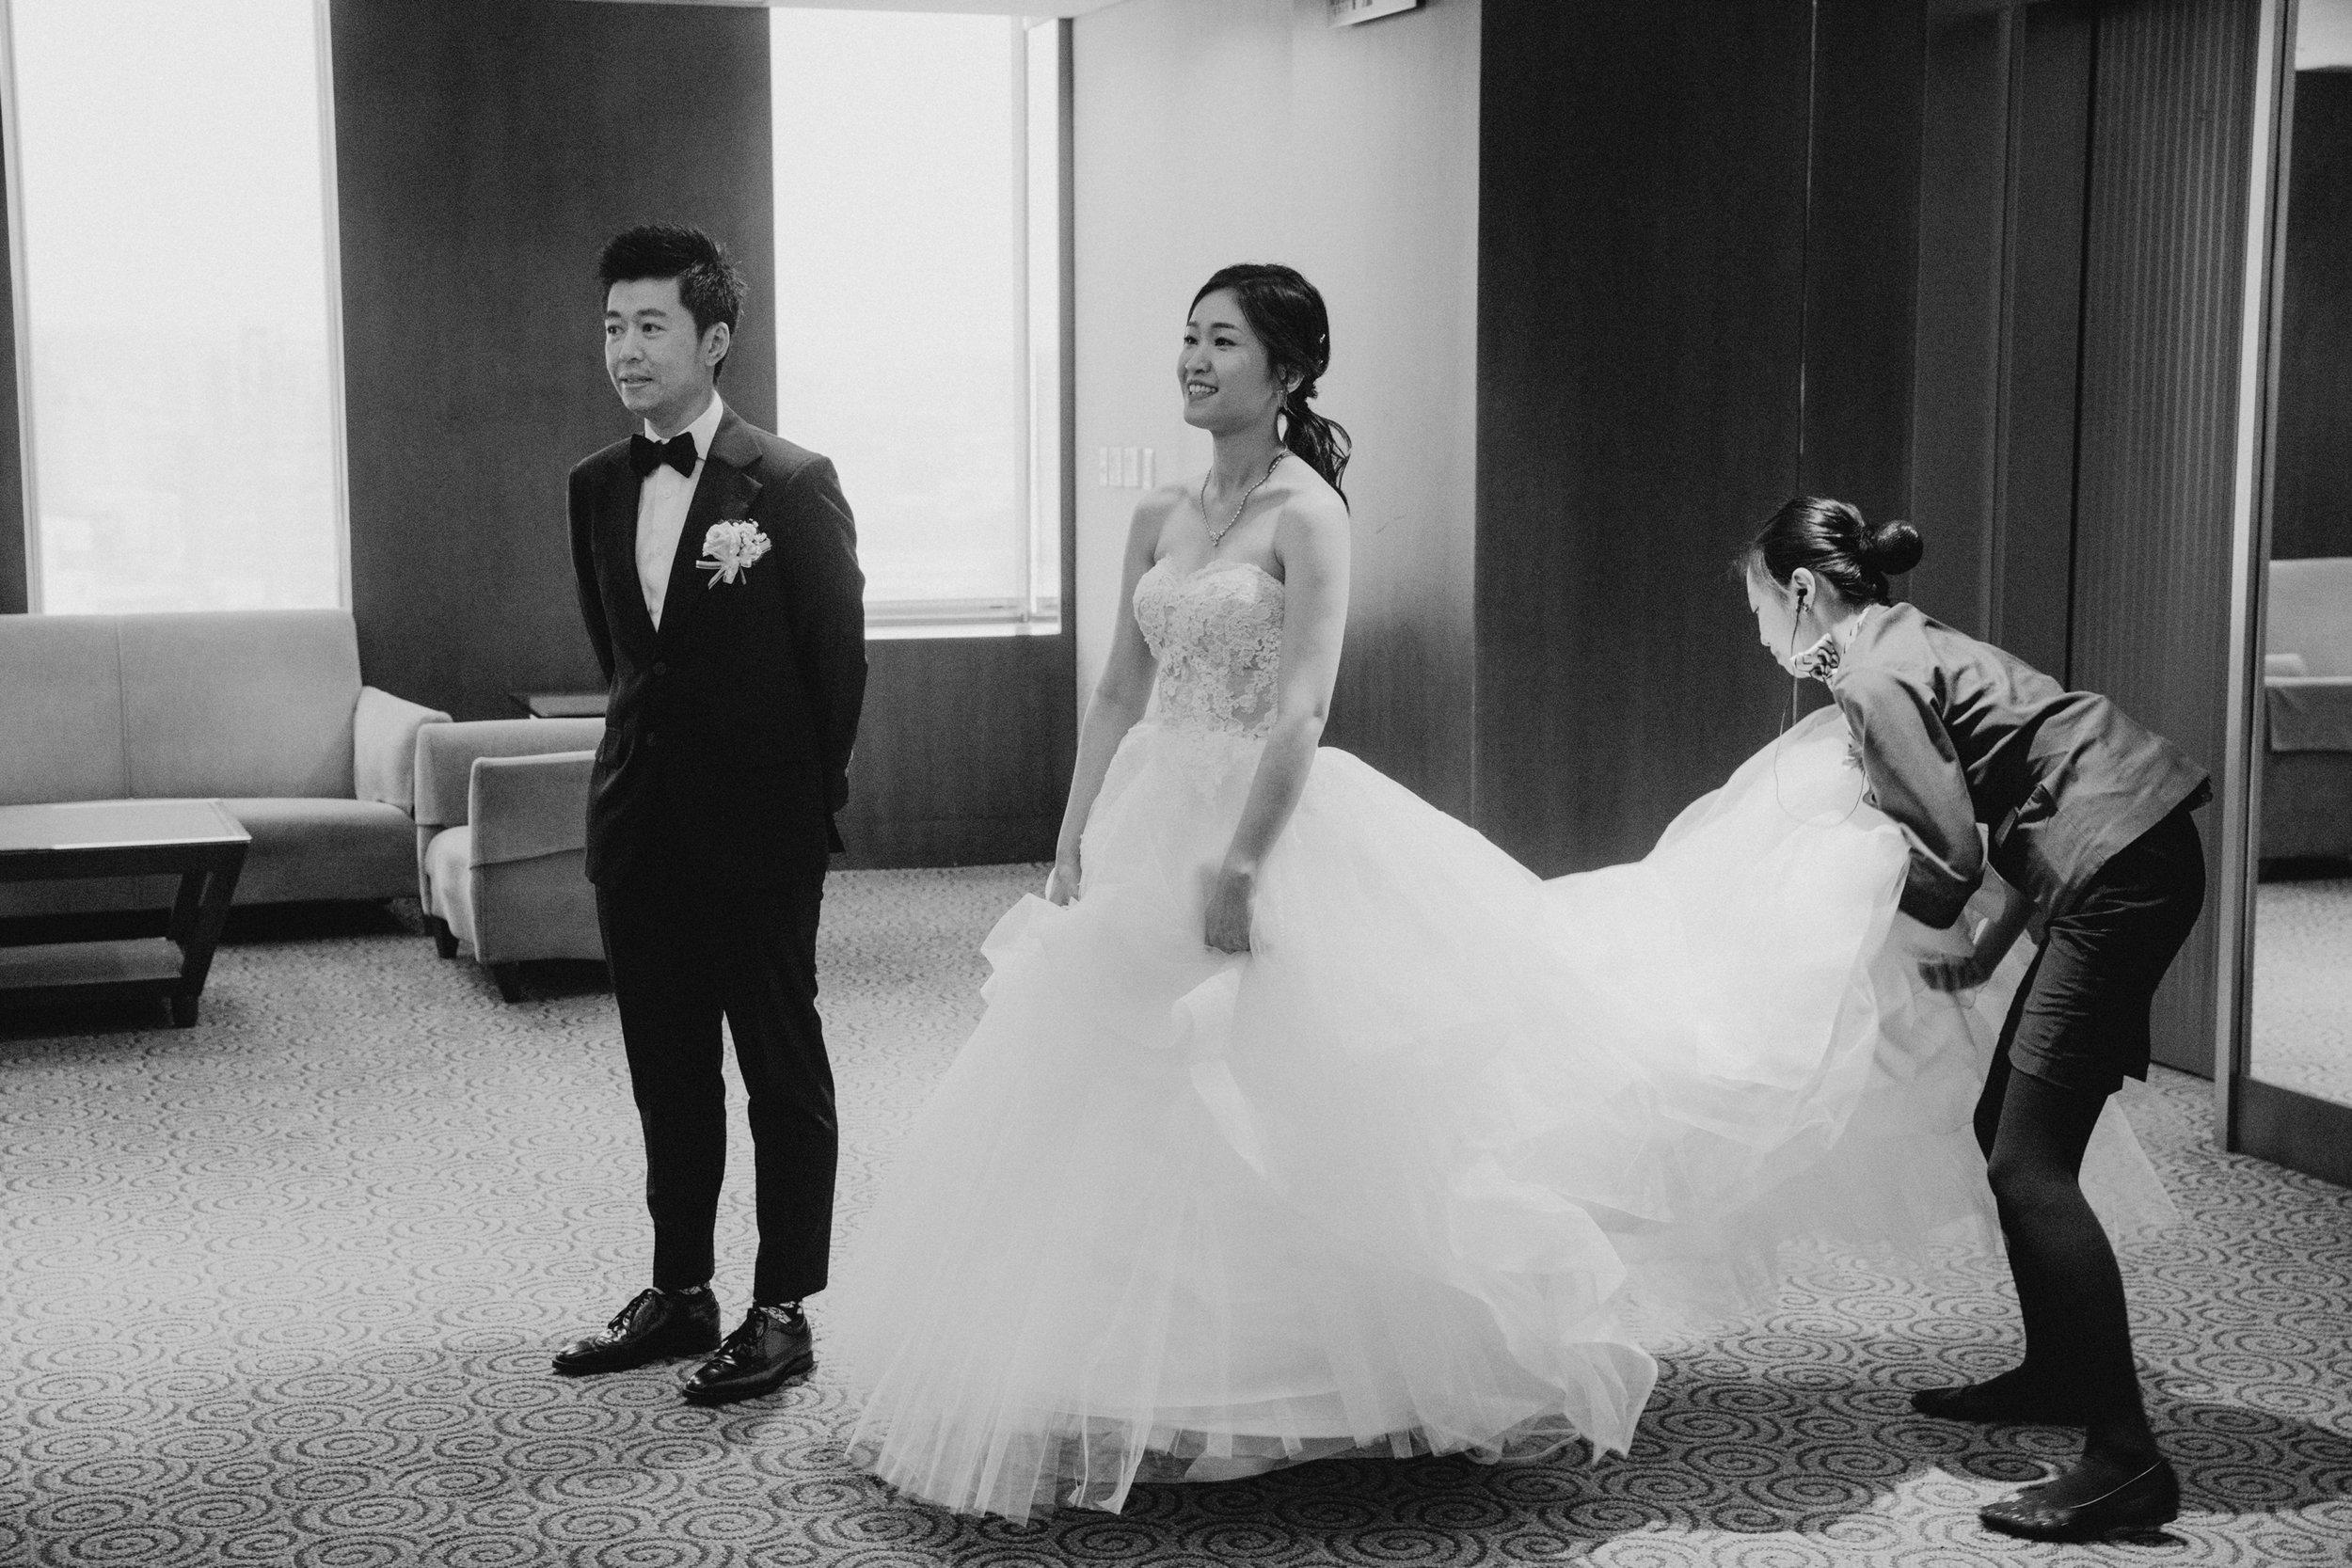 wedding-caridee-oscar-lunch-ambassador-hsinchu-結婚午宴-新竹國賓_52.jpg